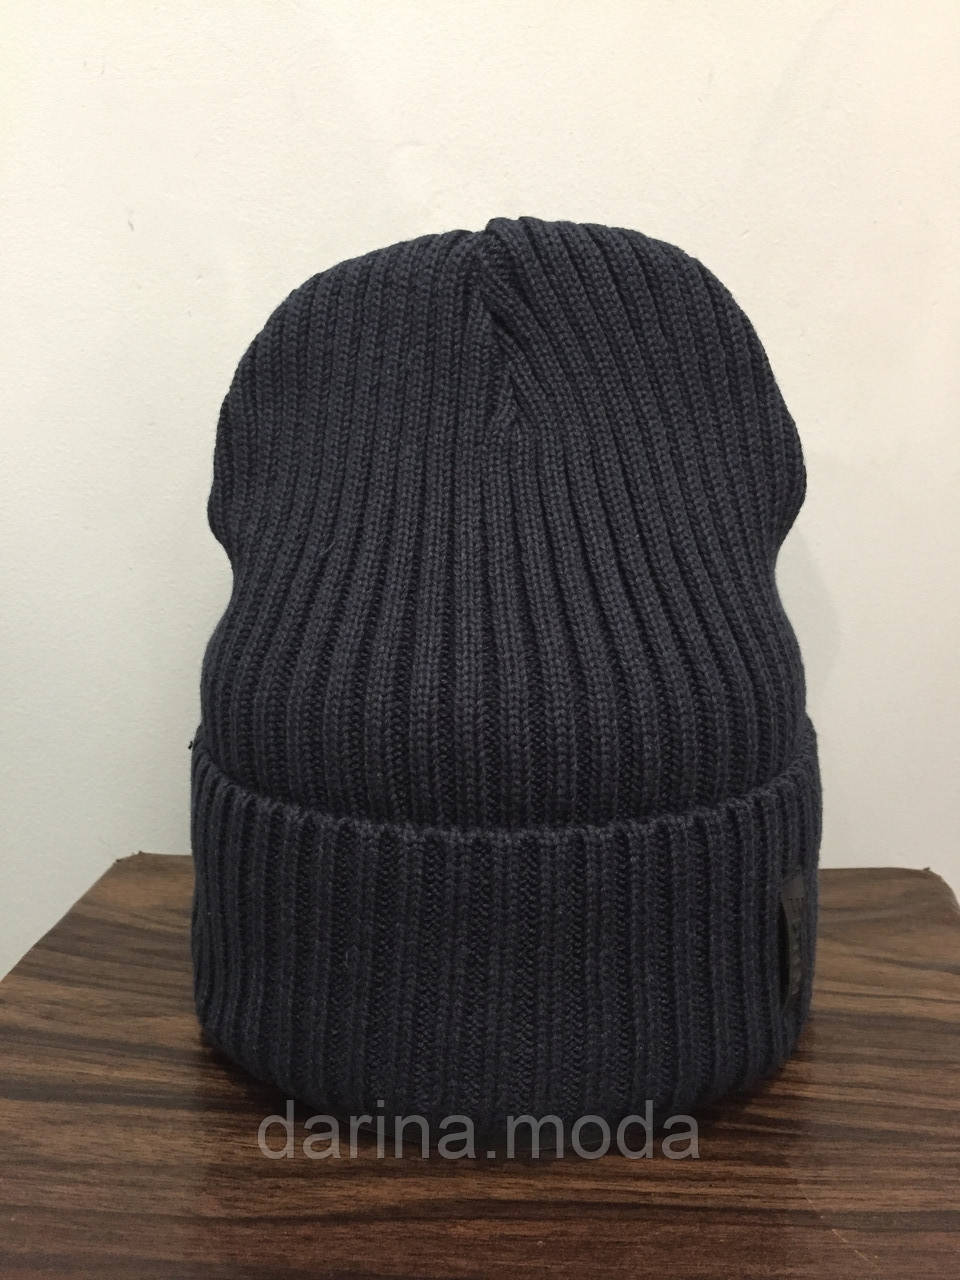 Зимняя молодежная шапка